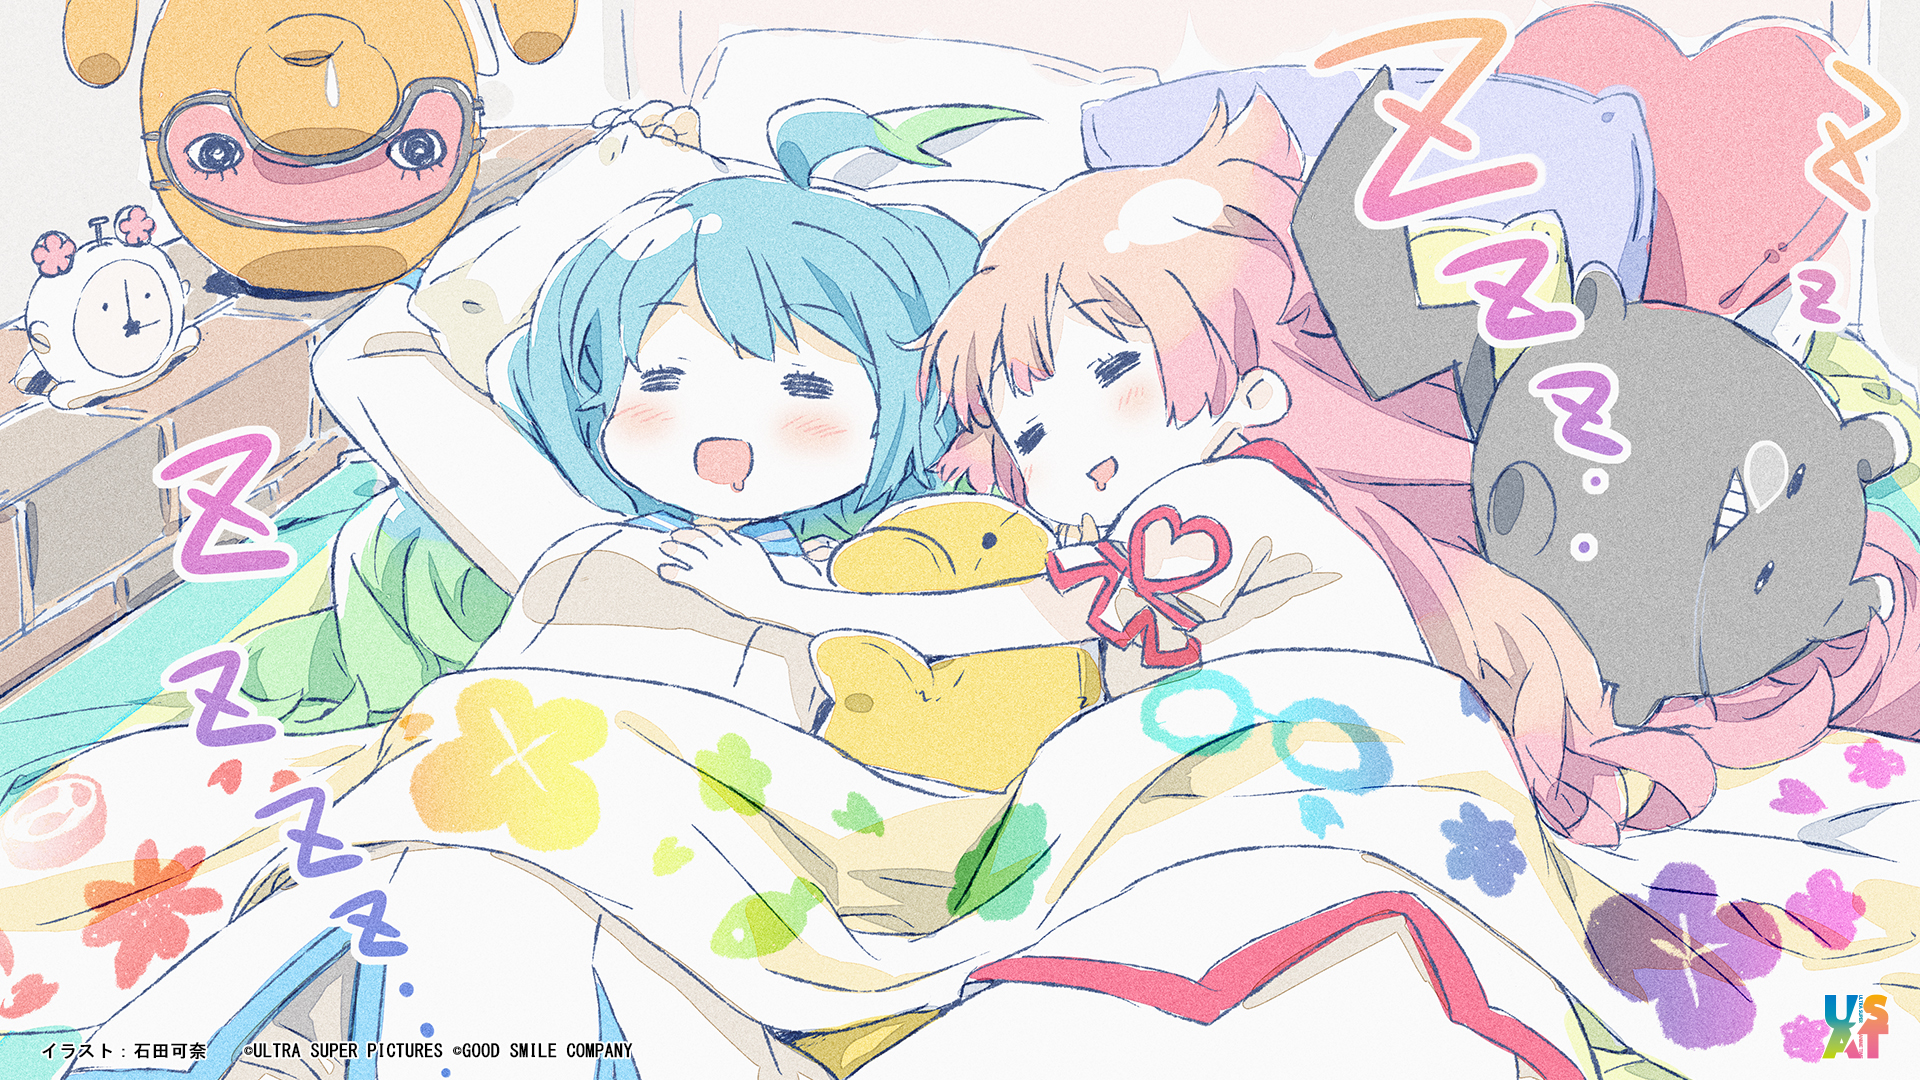 sumako and supika (ultra super anime time) drawn by ishida kana